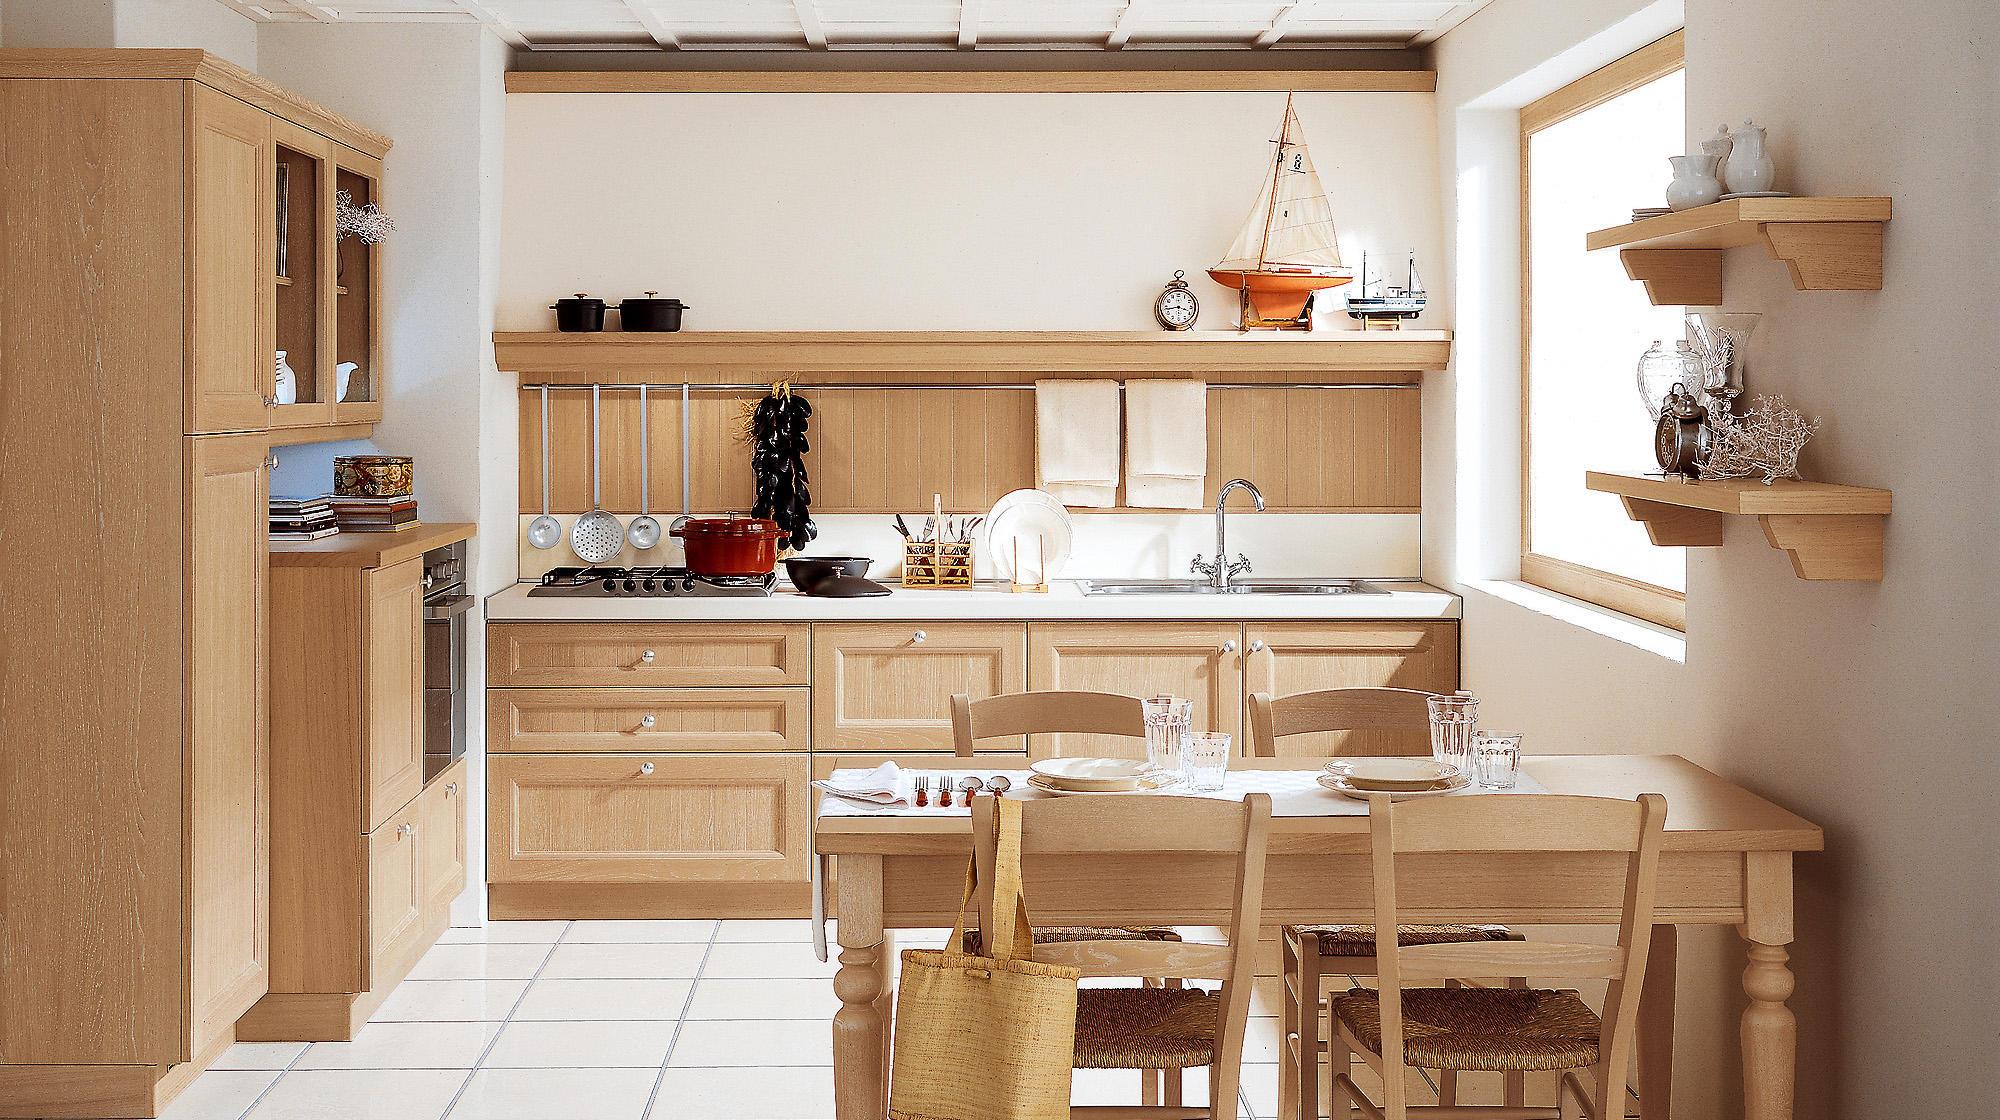 Stunning Memory Veneta Cucine Contemporary Design